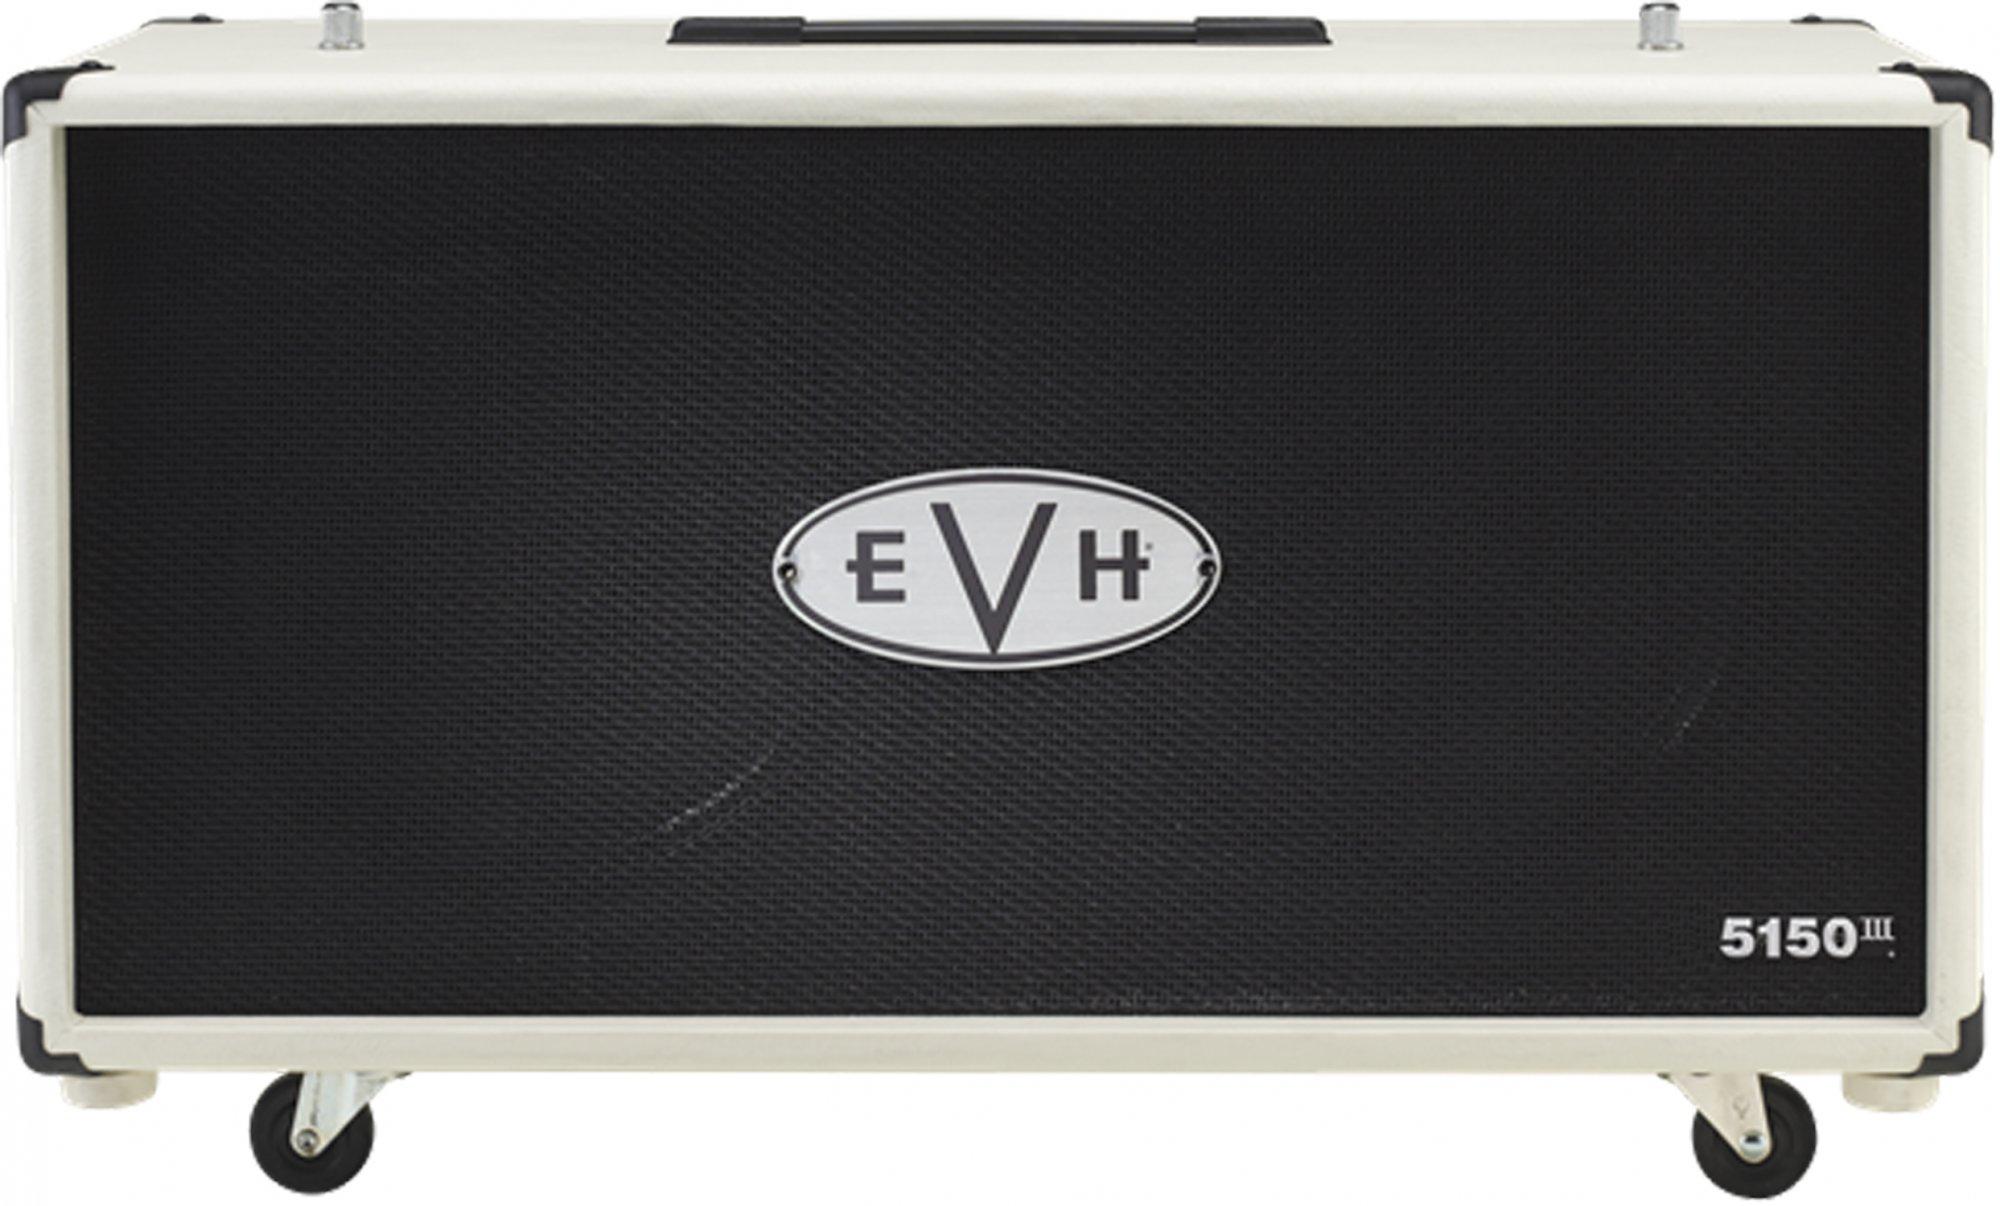 EVH 5150 III 2x12 Cabinet Ivory